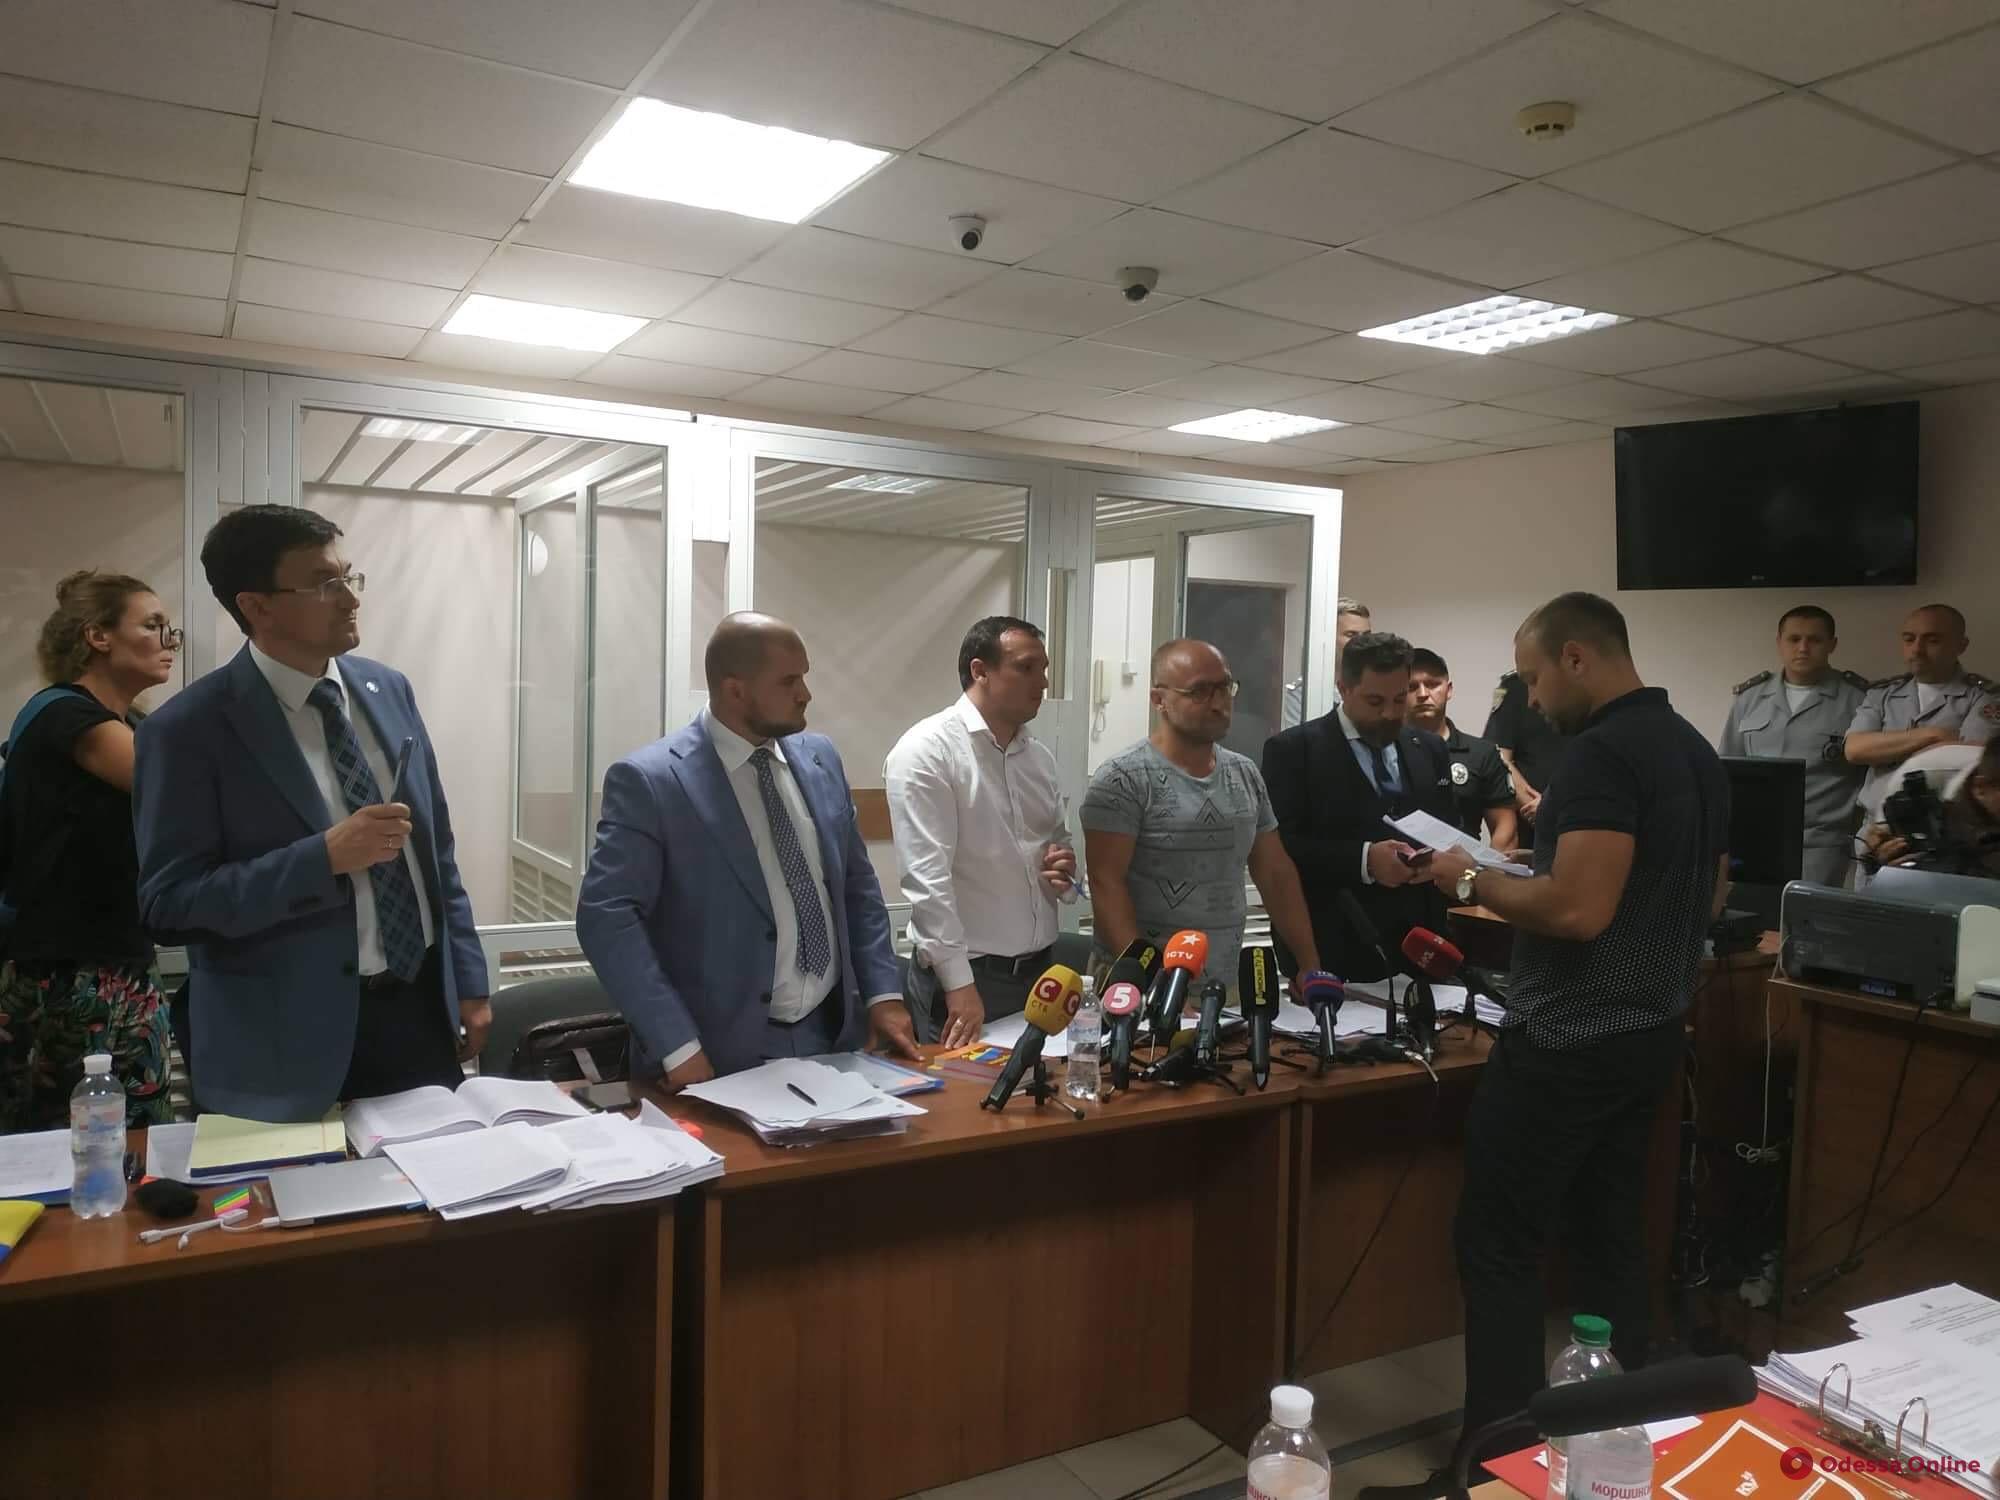 Пожар в «Токио Стар»: Вадиму Черному в зале суда повторно вручили подозрение